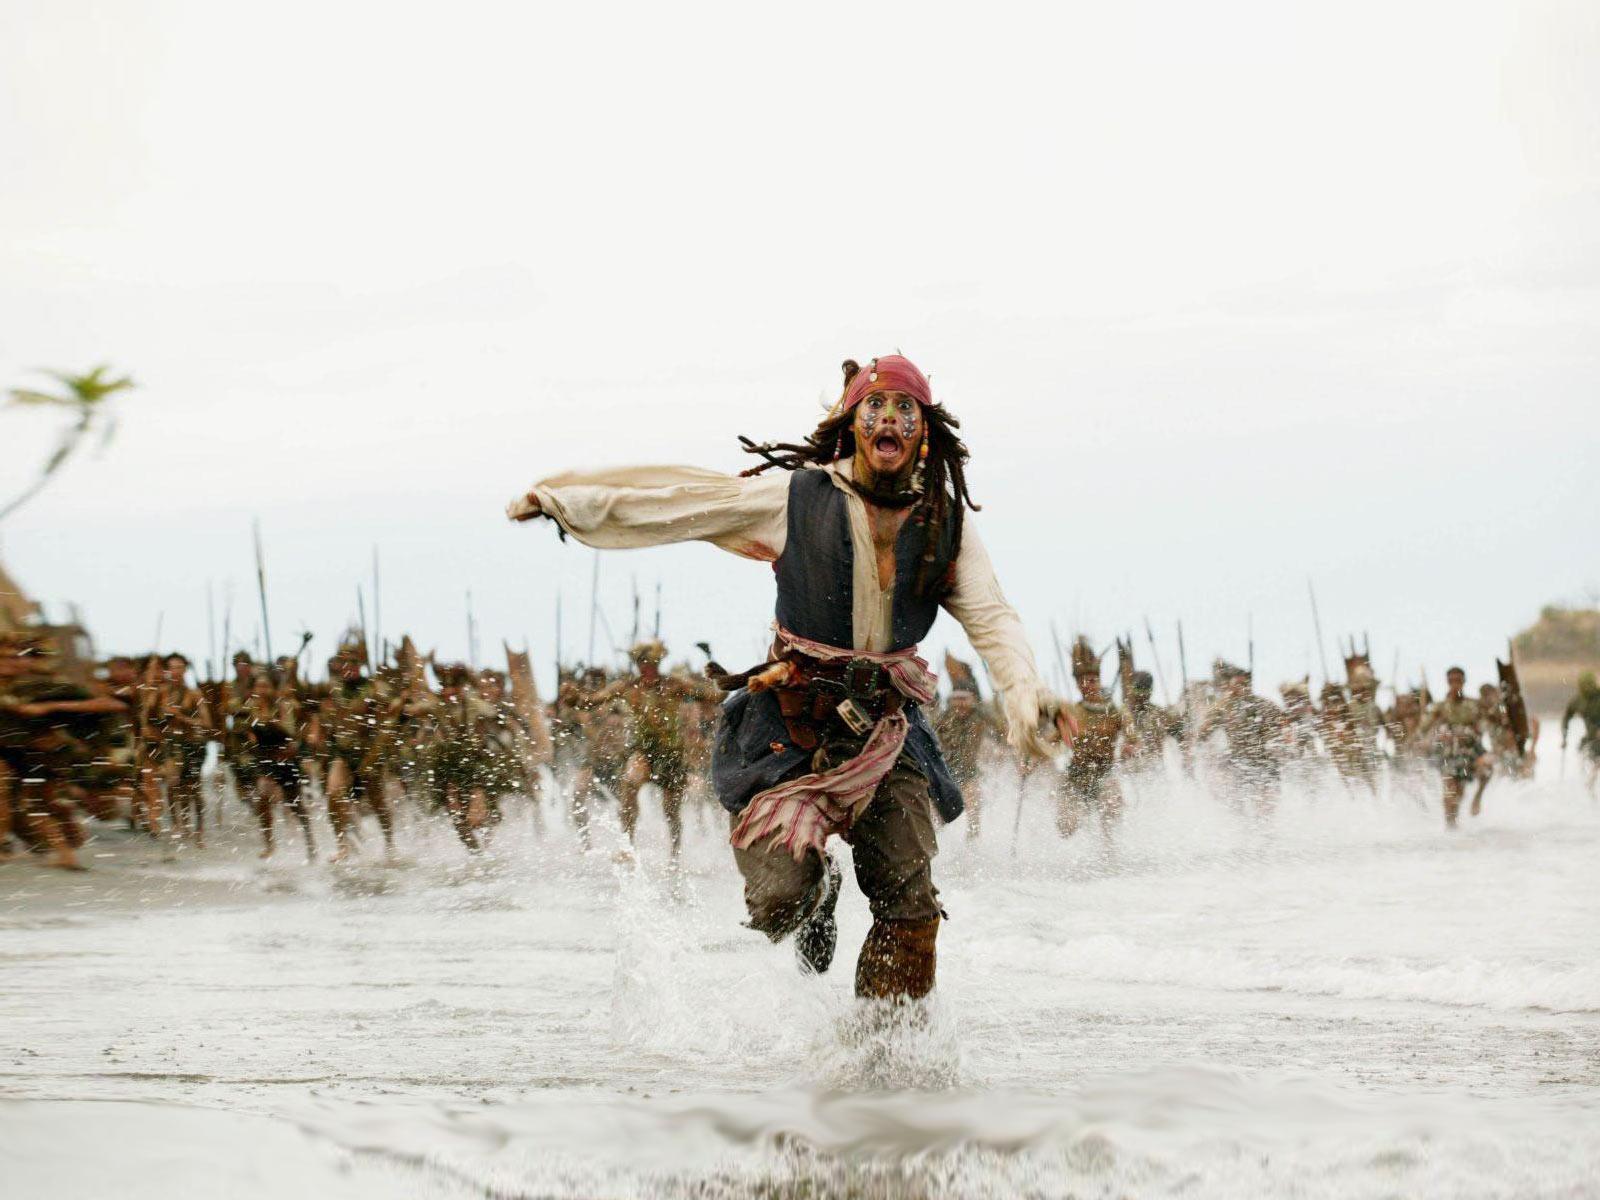 http://3.bp.blogspot.com/-5OJaOthstf0/TfEK9QAe43I/AAAAAAAAB1k/qSuZnejV1AQ/s1600/Captain_Jack_Sparrow_-_Johnny_Depp.jpg